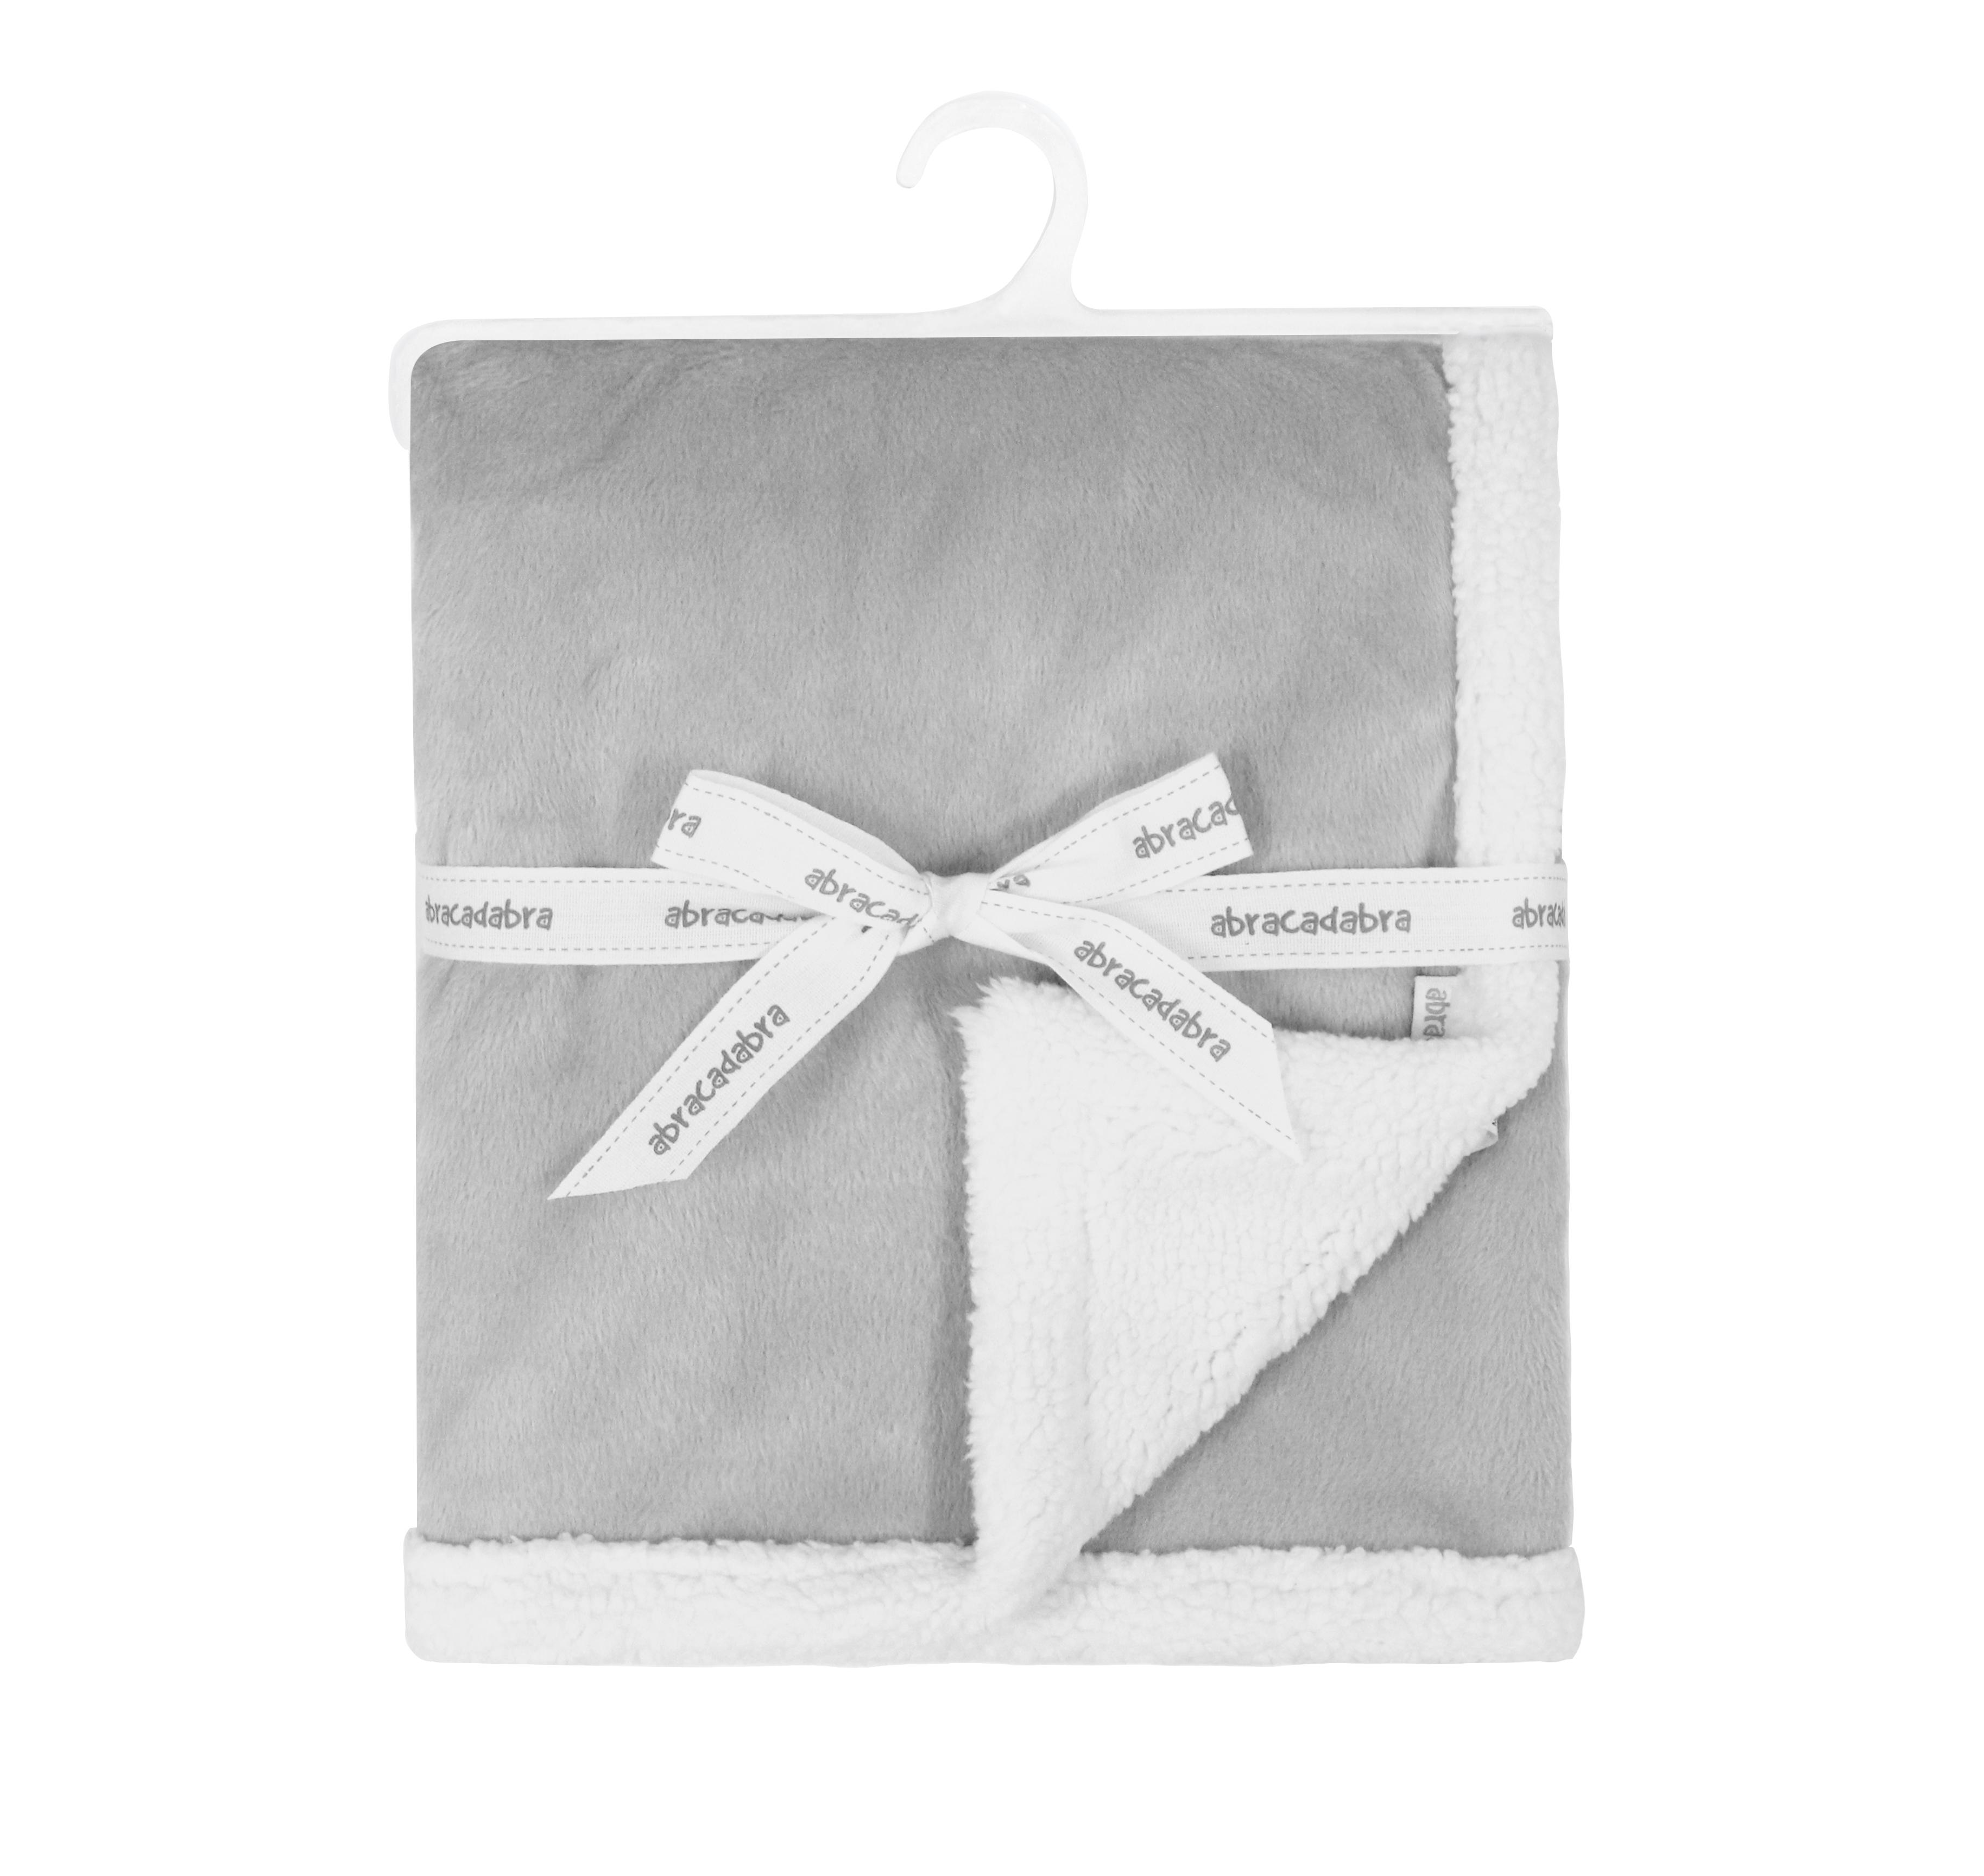 Mothercare   Abracadabra Chamois Blanket - Grey